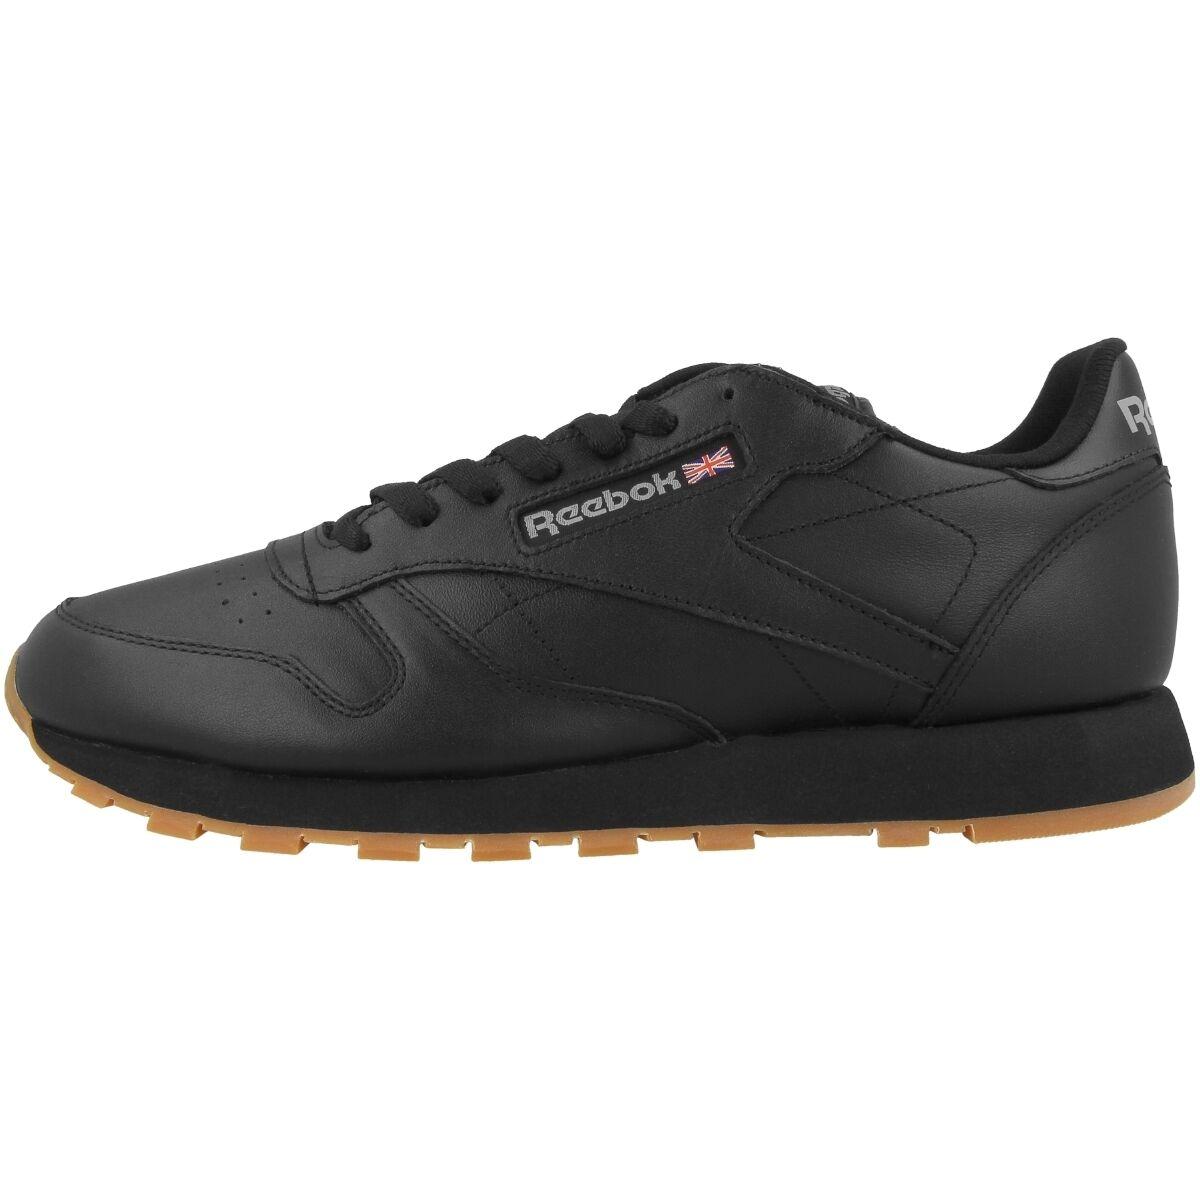 Reebok Classic Leather Turnschuhe Schuhe schwarz gum 49800 Freizeit Sport Fitness